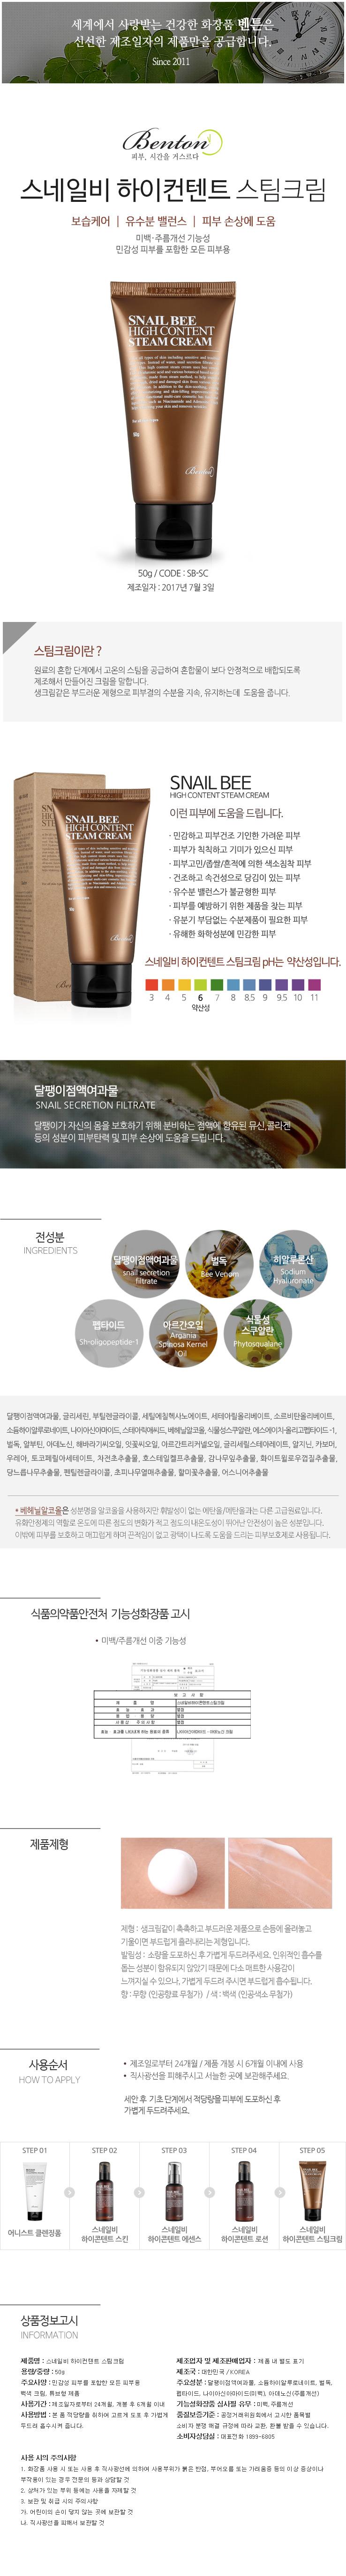 Benton Snail Bee High Content Steam Cream Seoul Next By You Malaysia Essence 5 Gram 50ml Singapore Indonesia